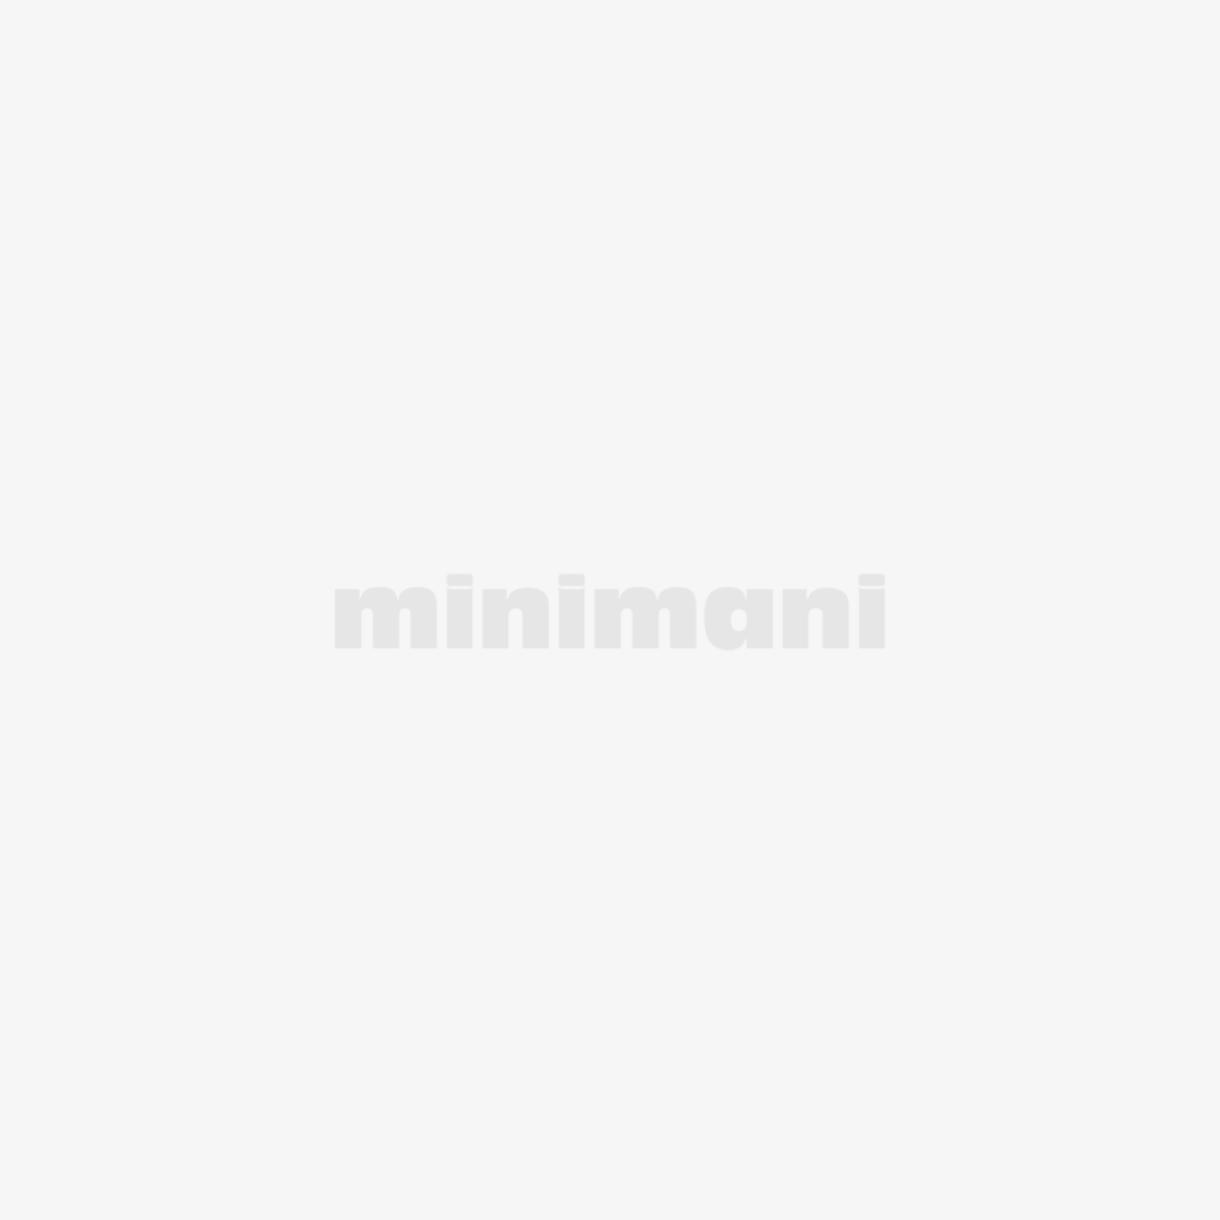 FINNWEAR NAISTEN PITKIKSET, BAMBU XL 1210 SORT